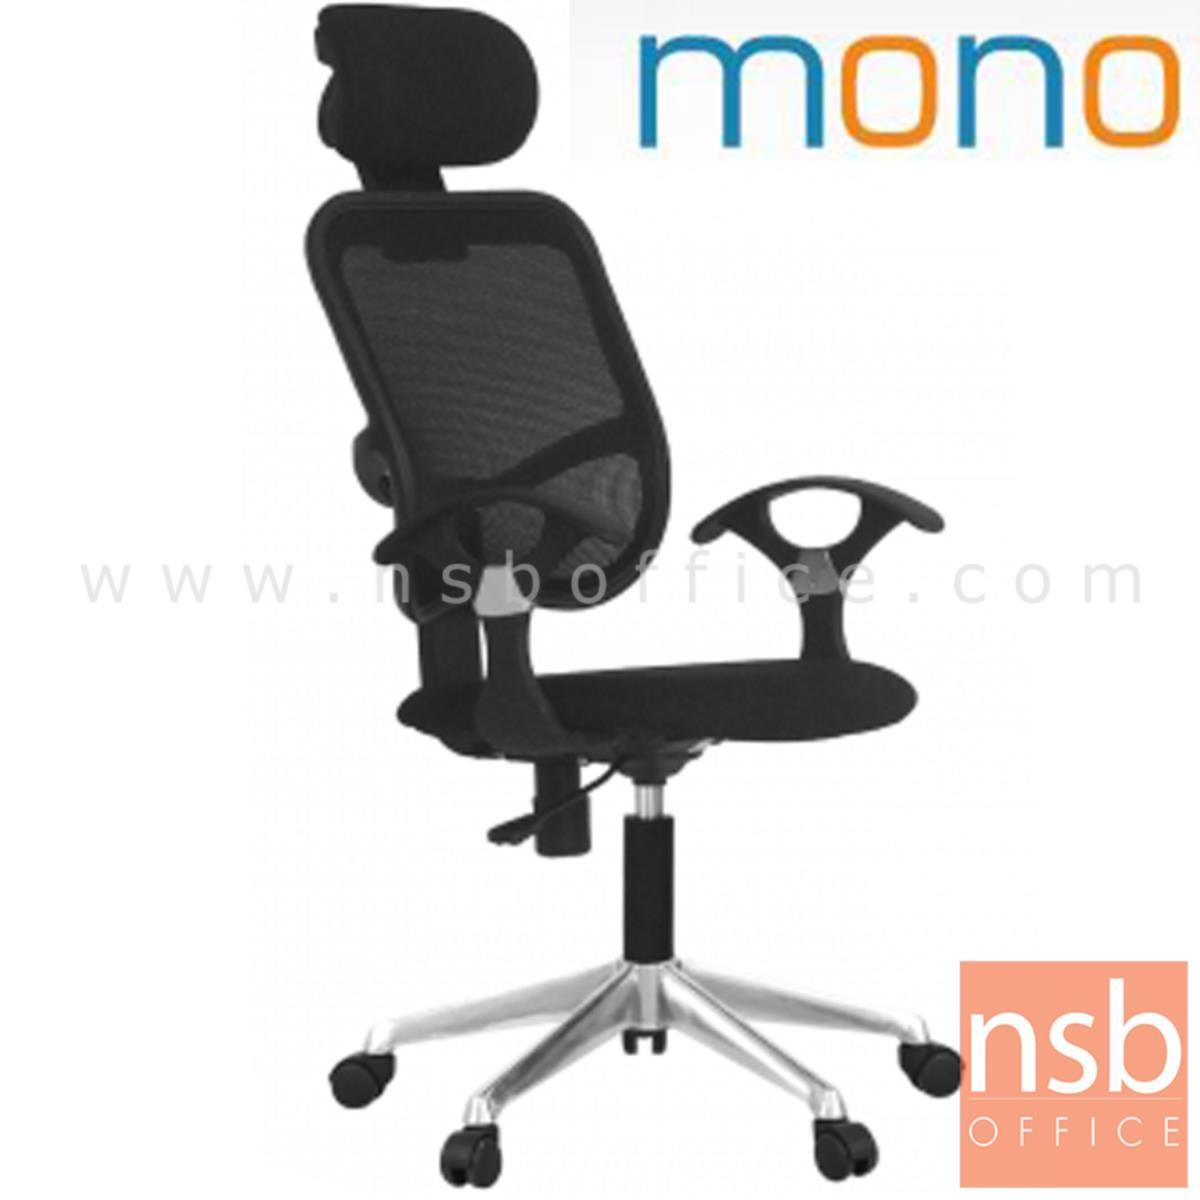 B24A184:เก้าอี้ผู้บริหารหลังเน็ต รุ่น JOTUN_JO 02/H โช๊คแก๊ส มีก้อนโยก ขาพลาสติก